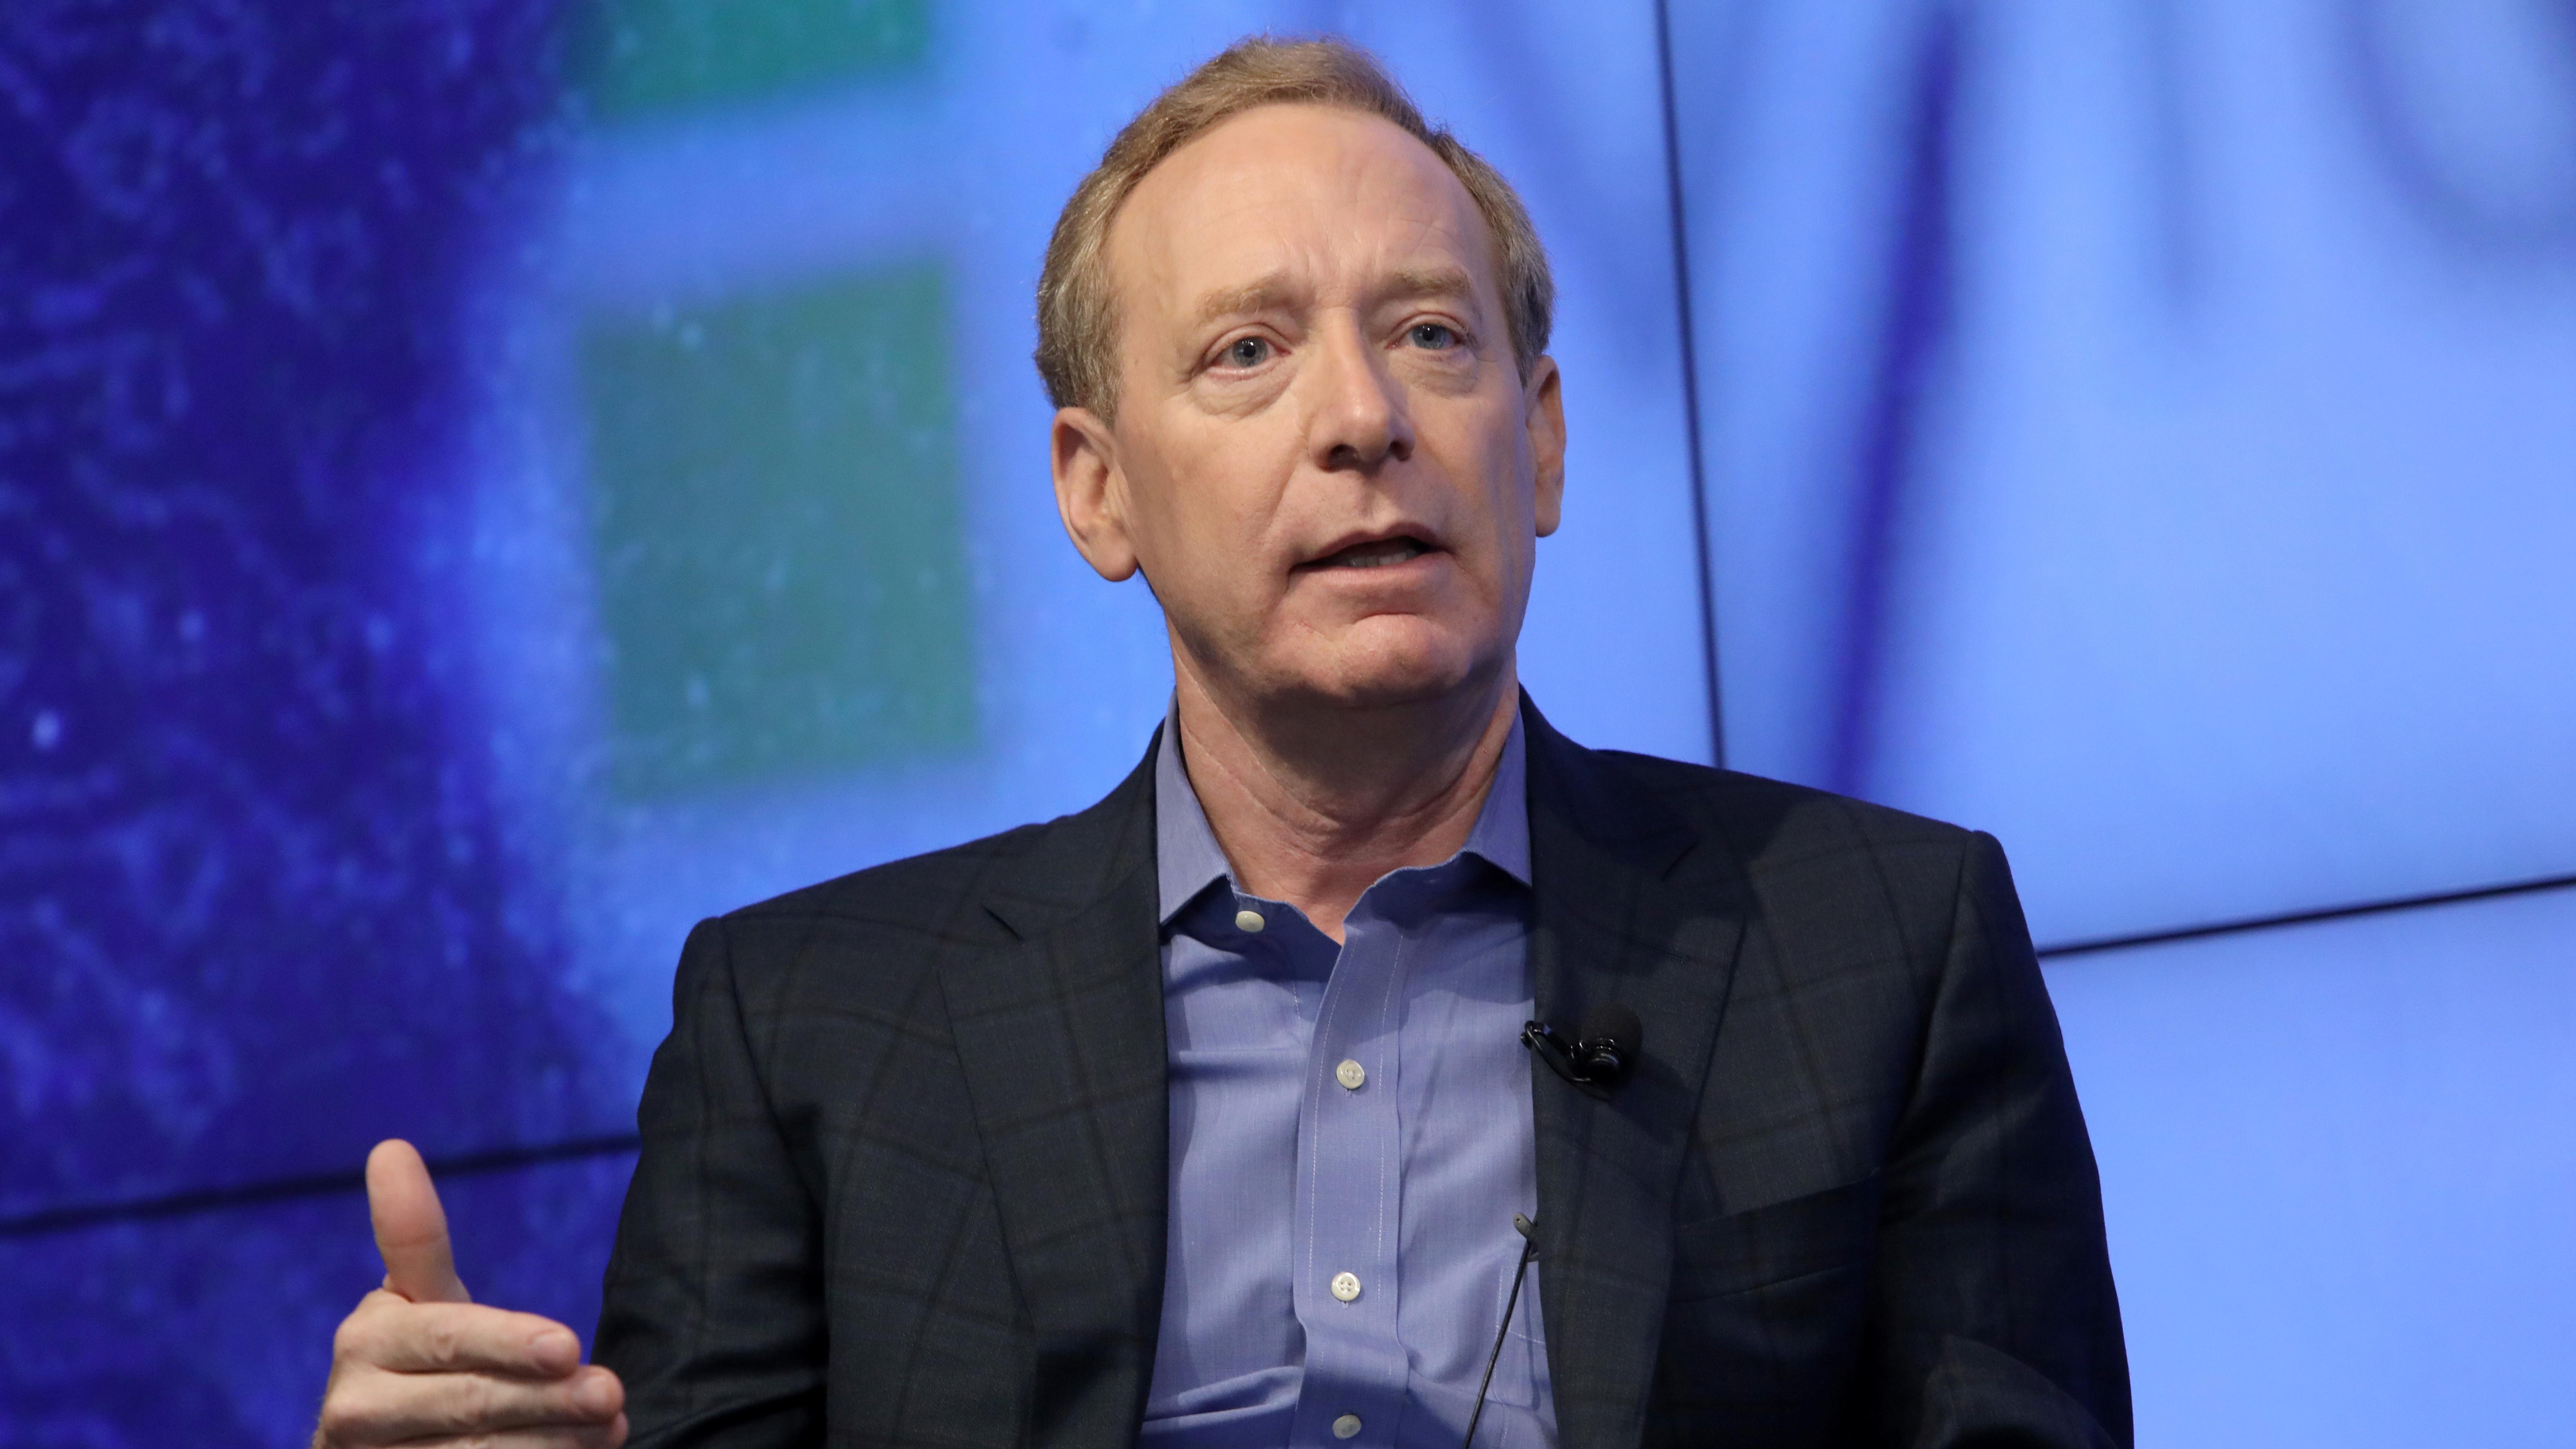 Microsoft President: Democracy Is At Stake. Regulate Big Tech